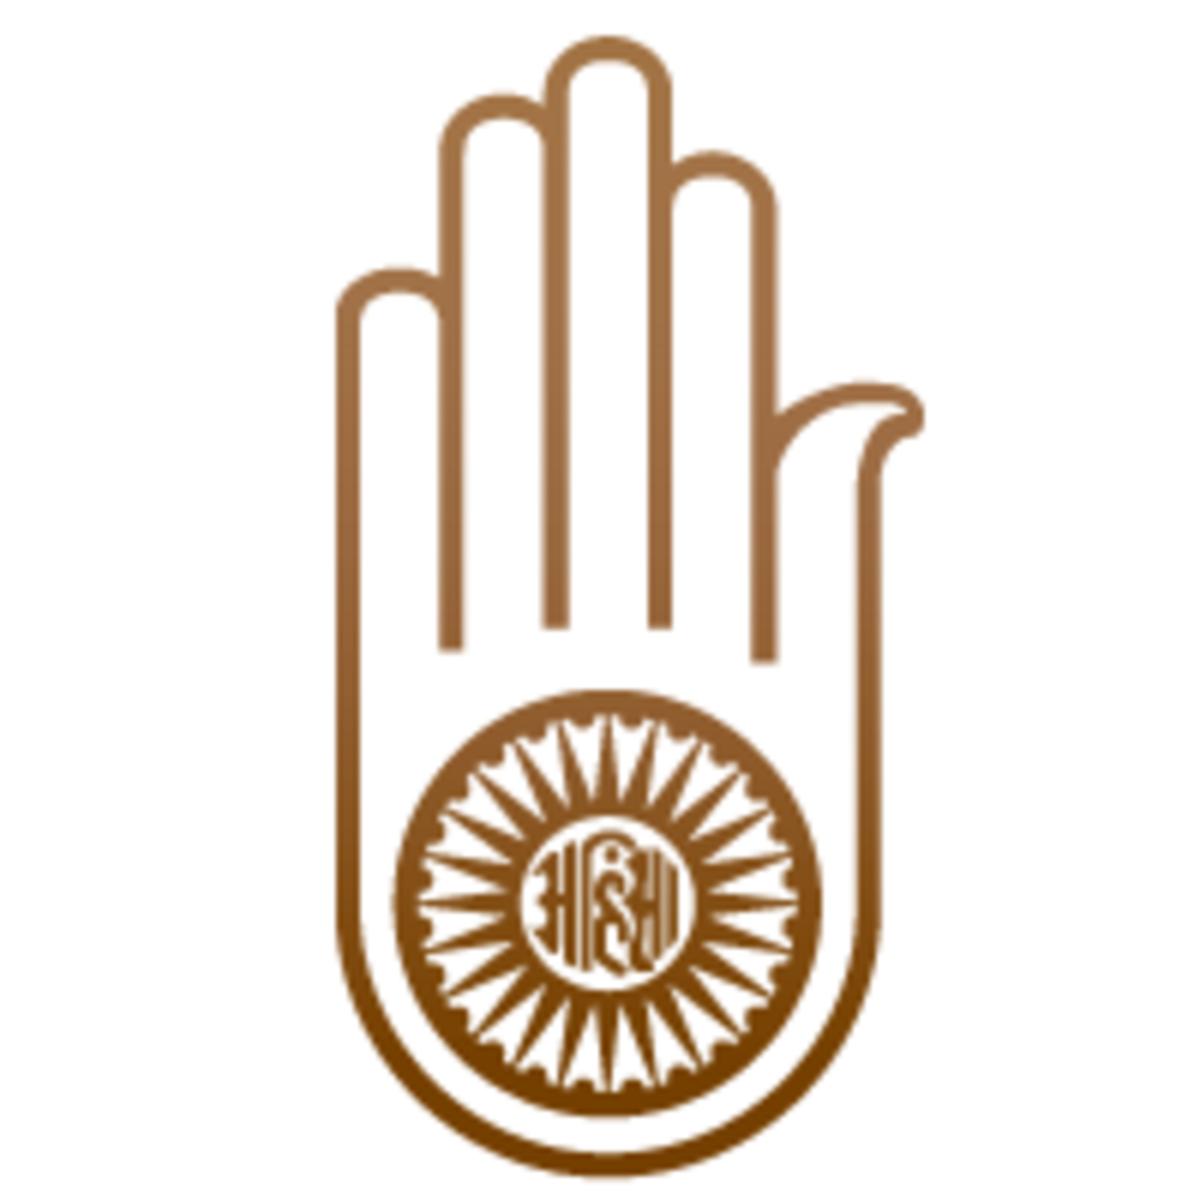 Ahimsa Hand